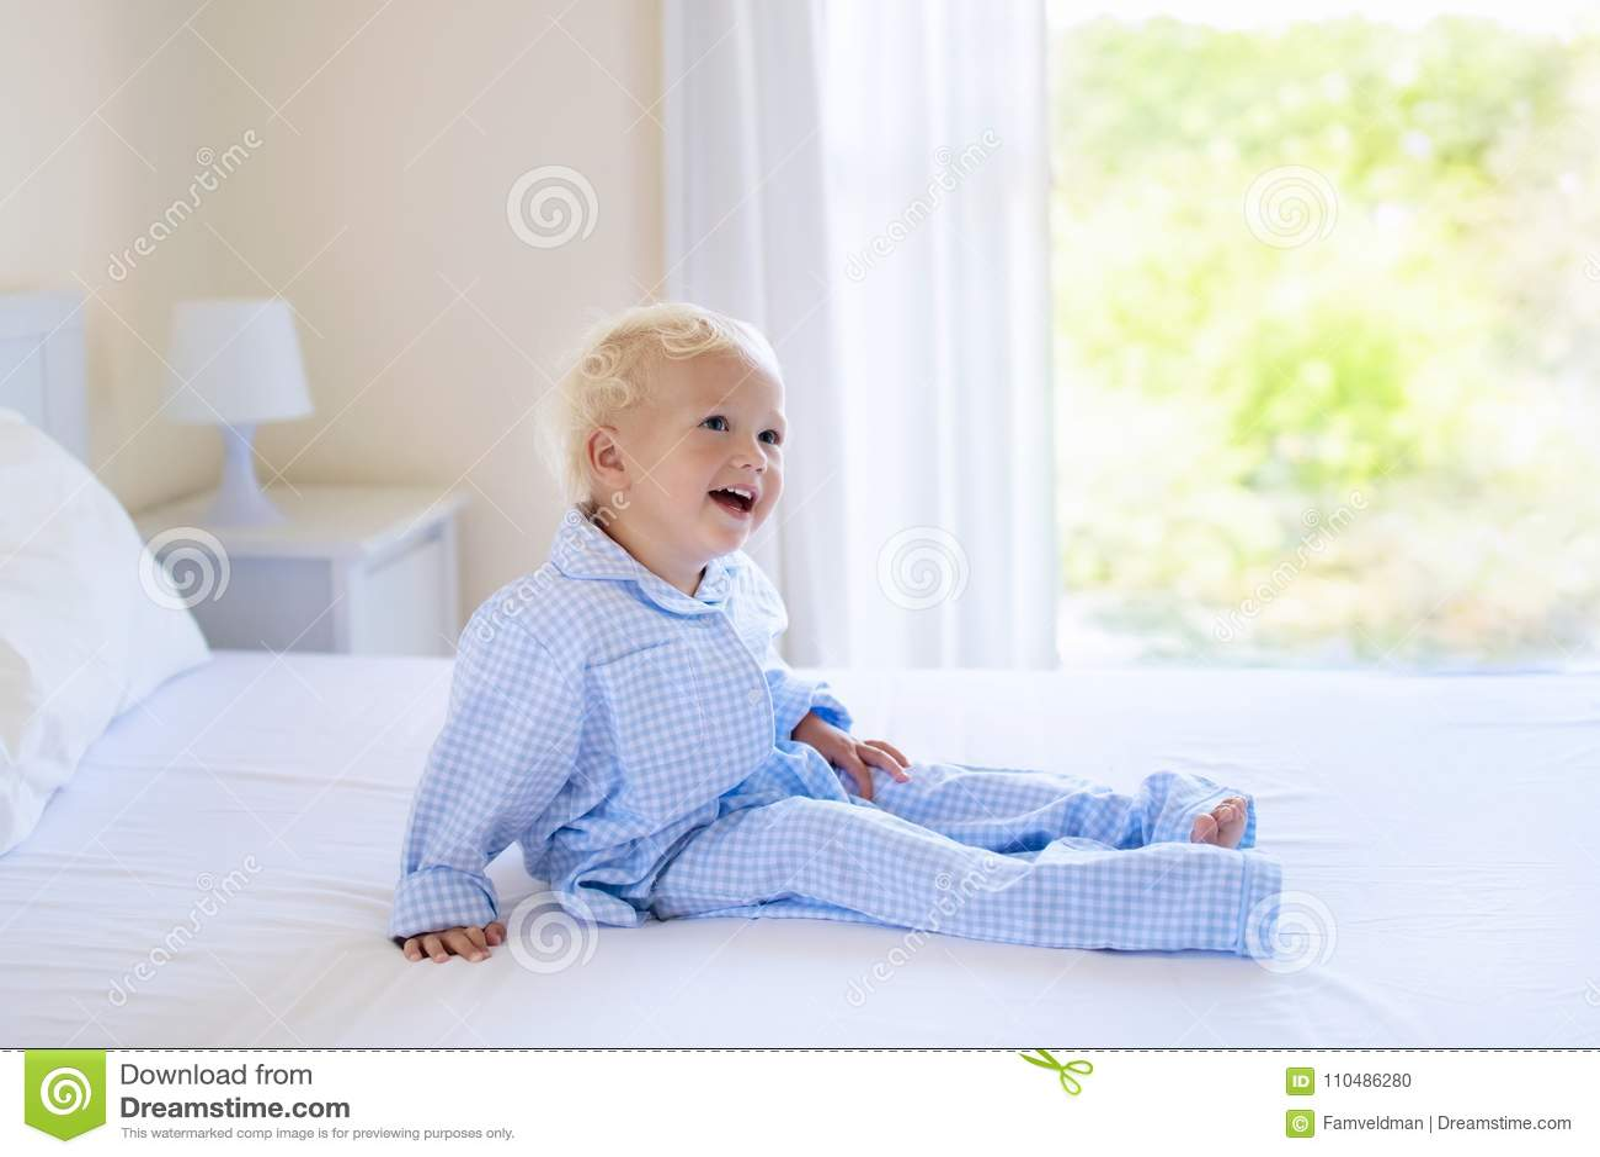 Kinder im bett kinder in den pyjamas familienschlafzimmer stockfoto